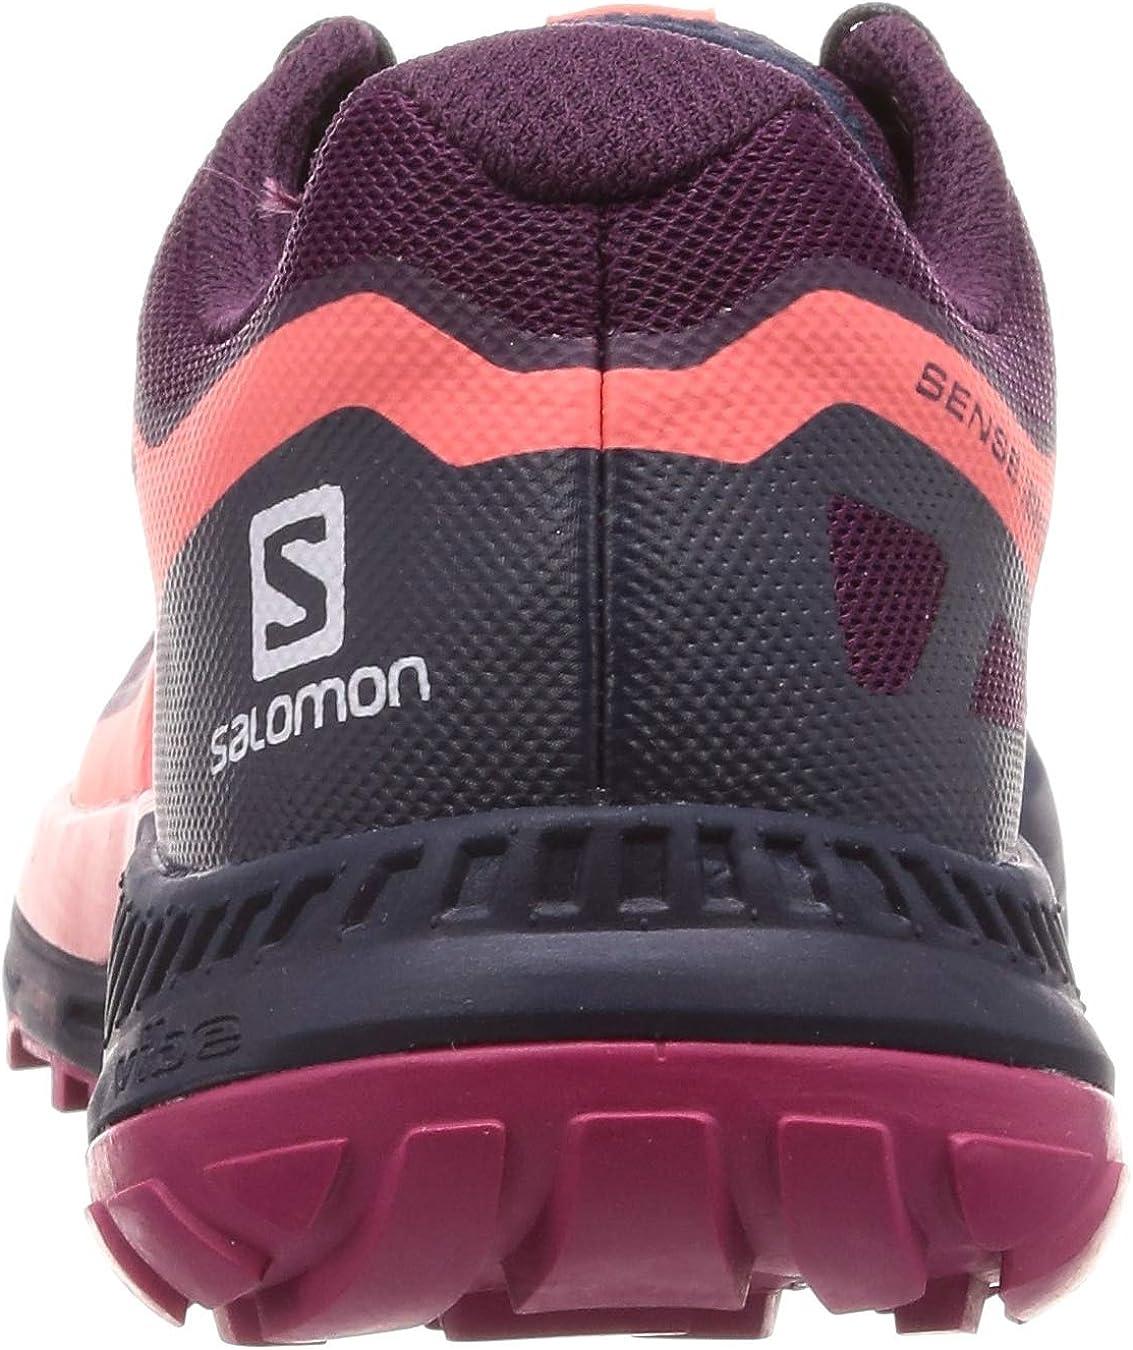 Salomon Sense Escape 2 W Zapatillas de Trail Running para Mujer